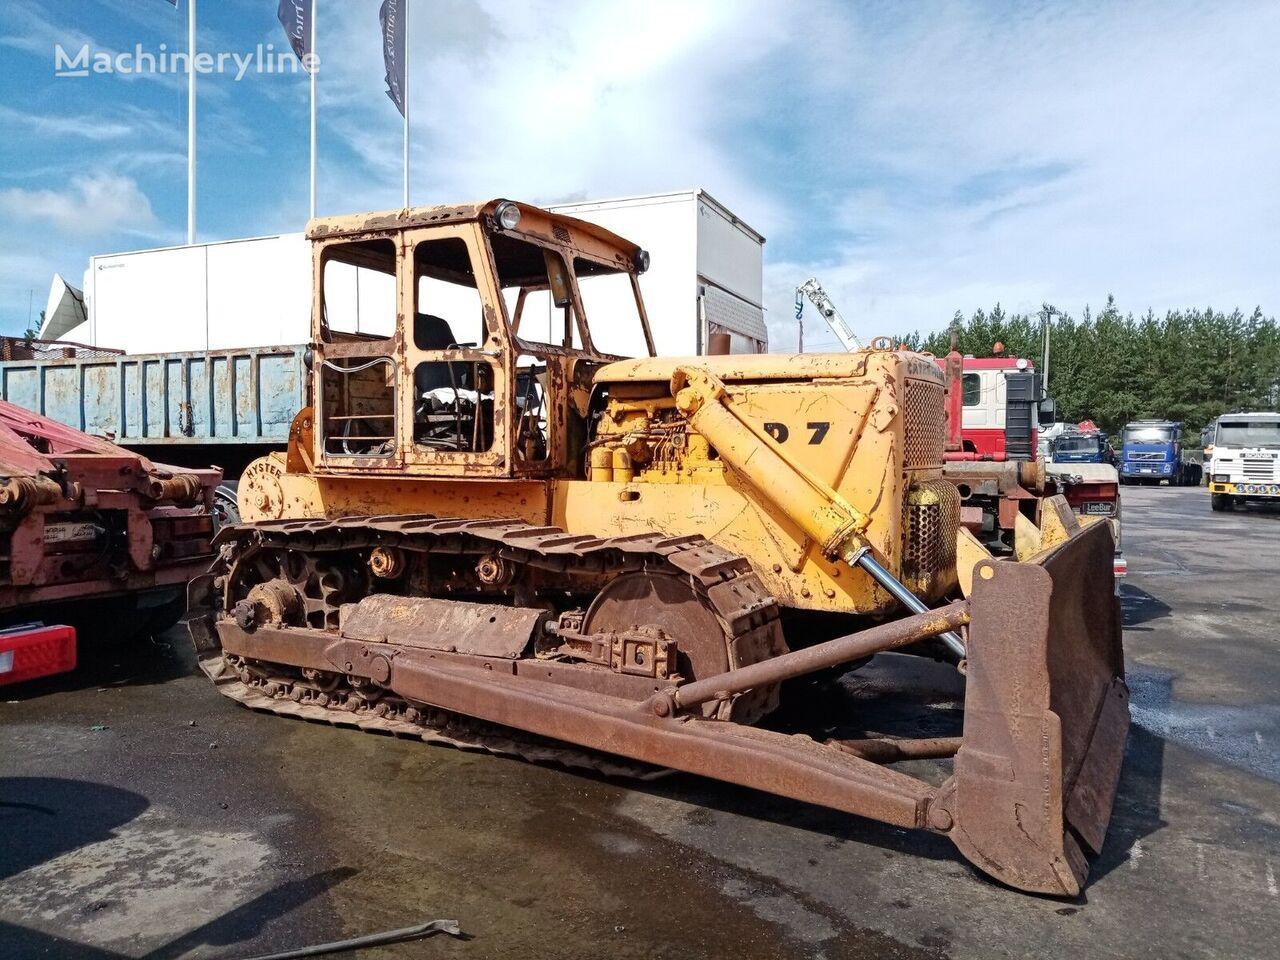 CATERPILLAR D7D bulldozer